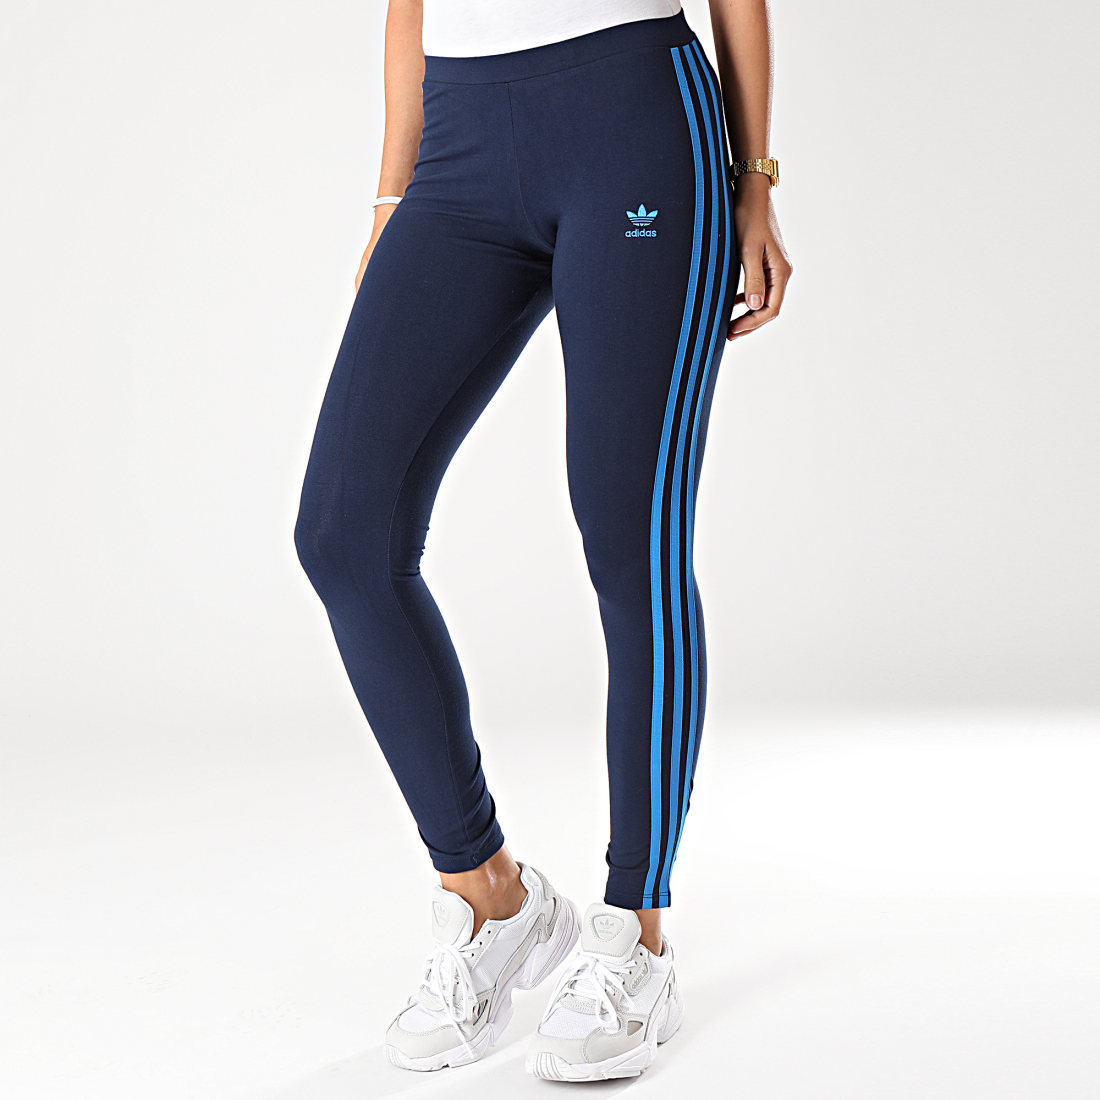 adidas - Legging Femme A Bandes 3 Stripes EJ9022 Bleu Marine ...